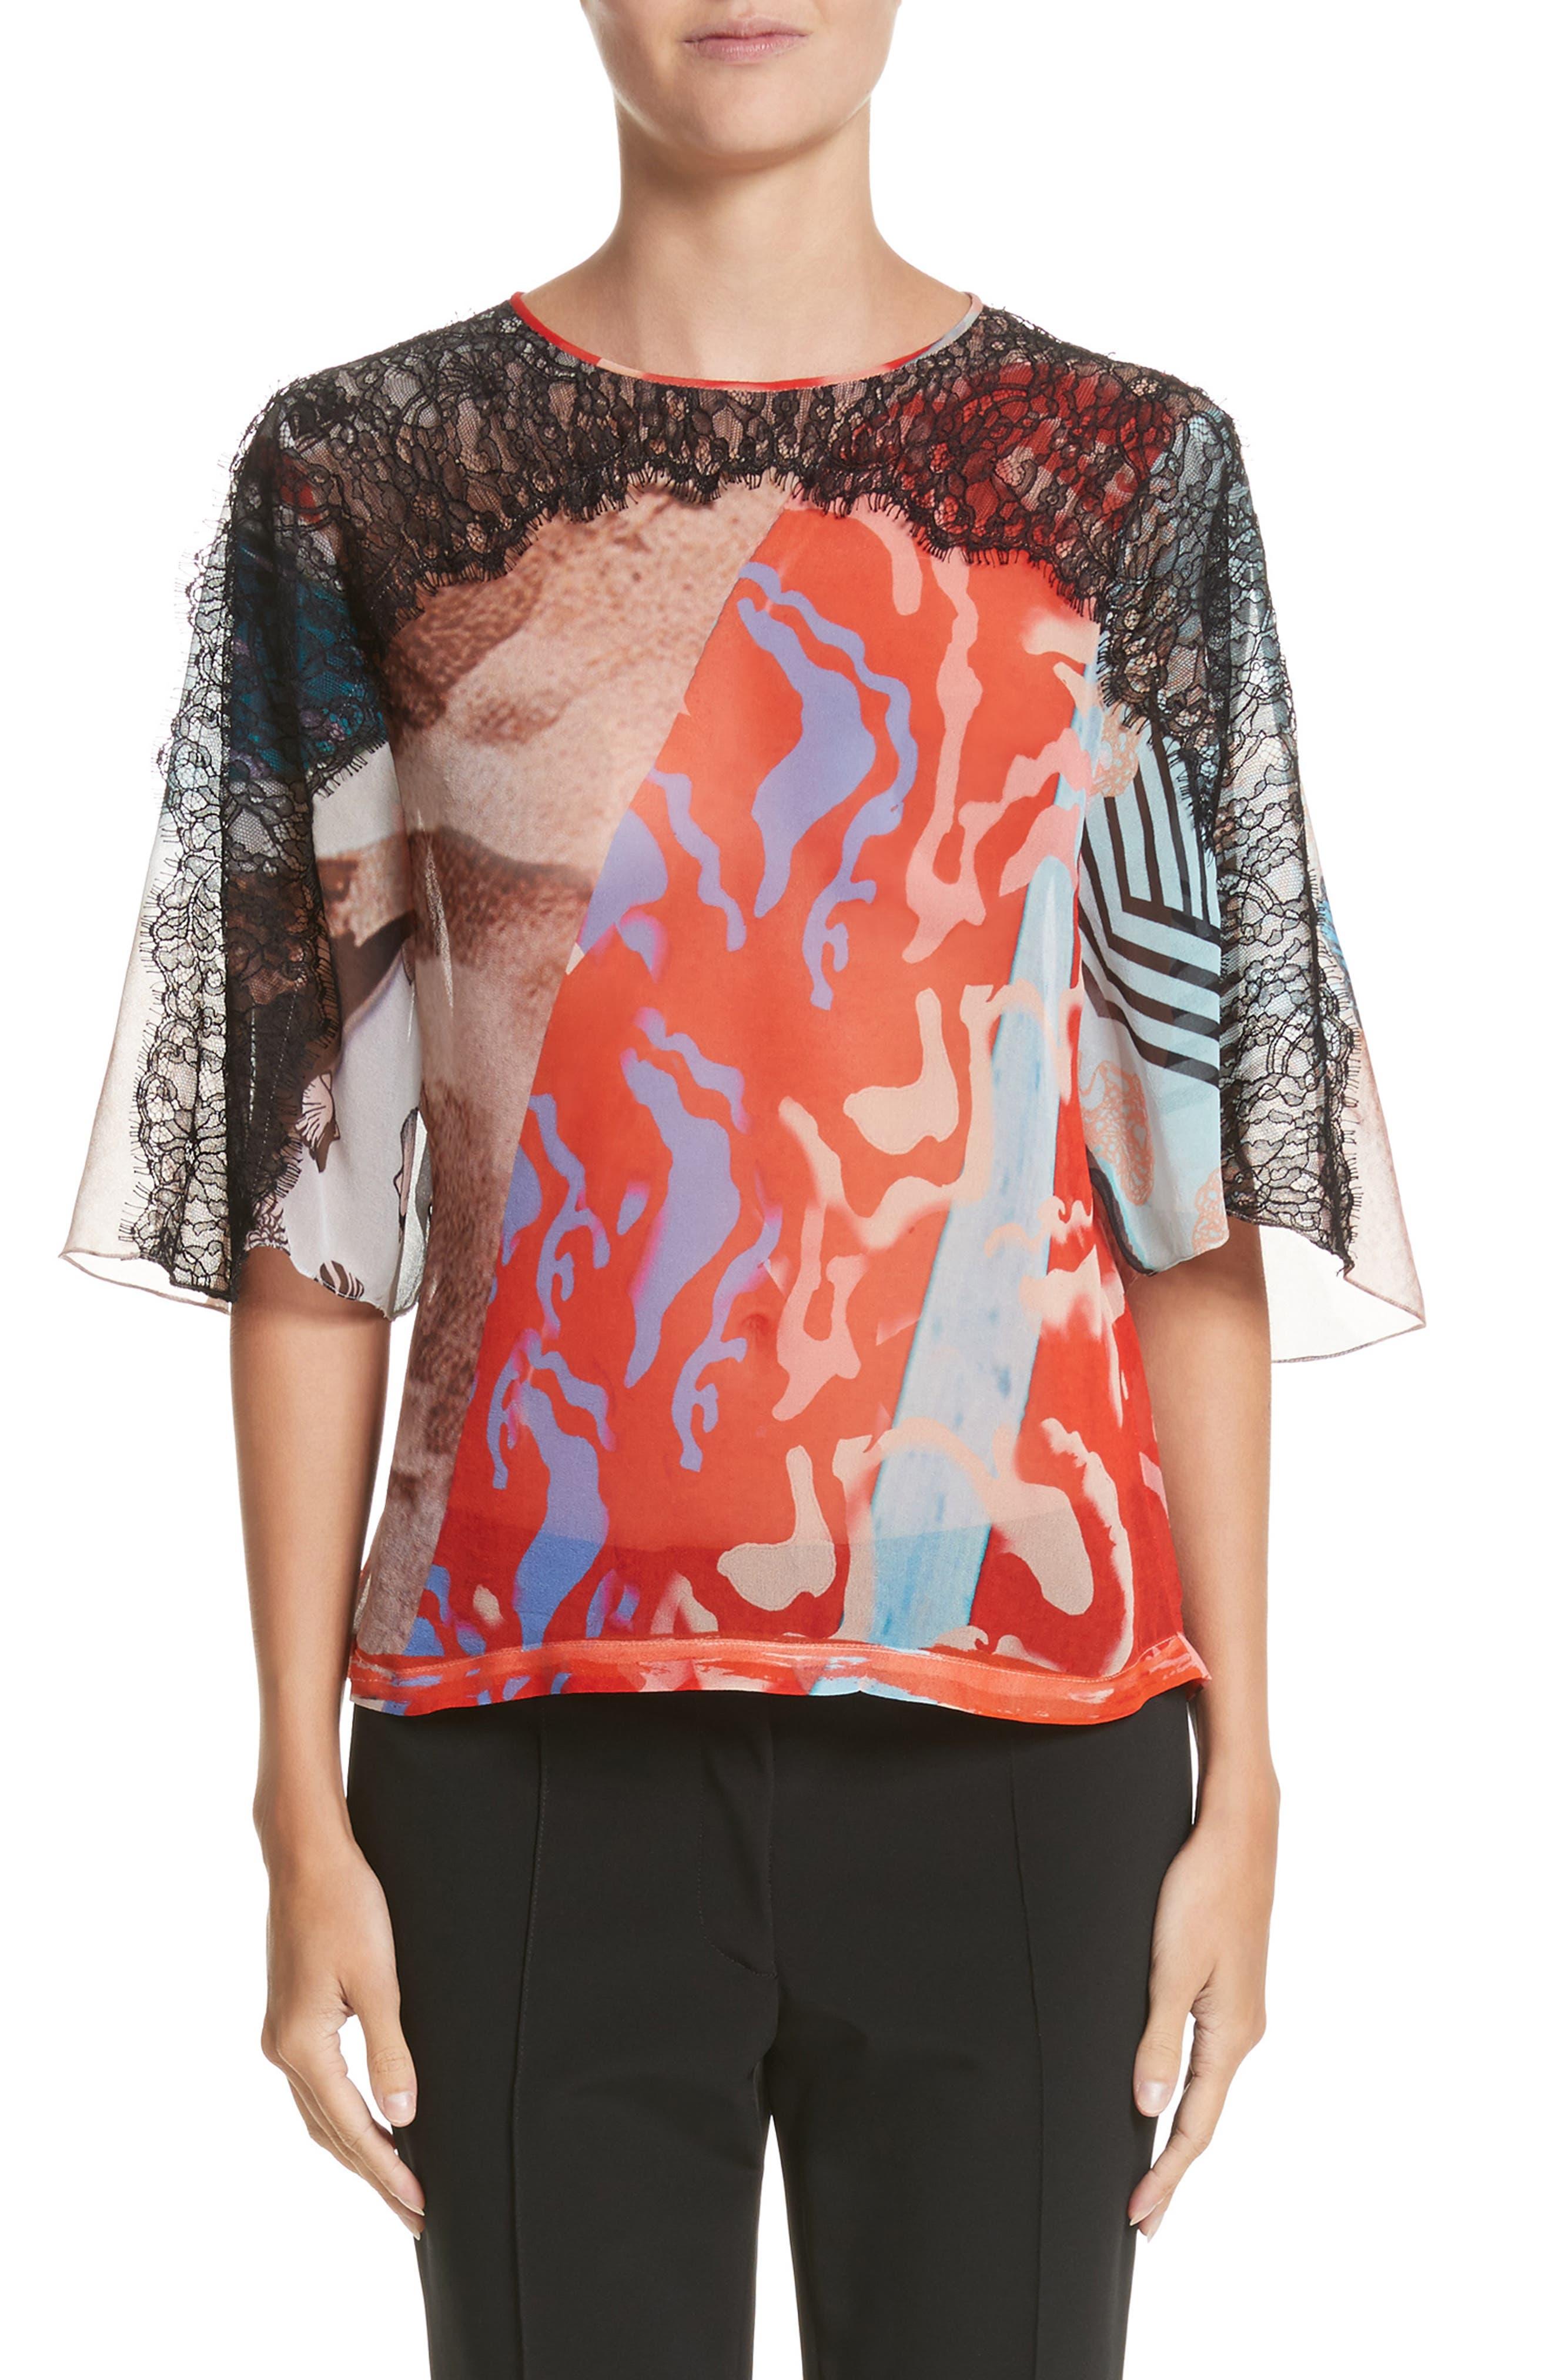 Yigal Azrouël Lace & Print Silk Top